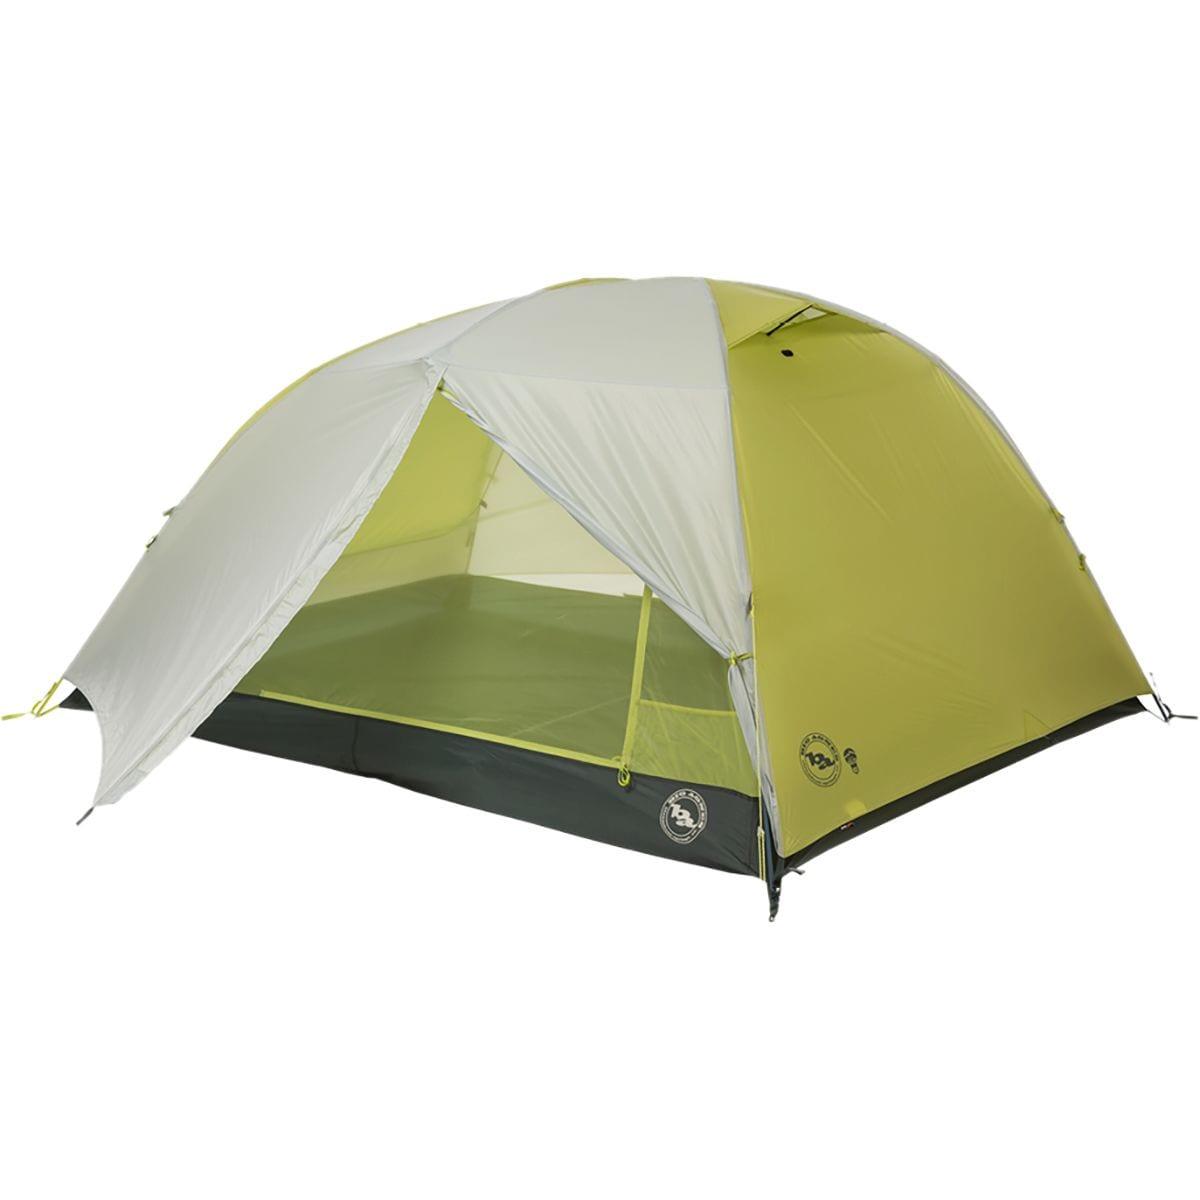 Big Agnes Manzanares HV SL 3 mtnGLO Tent - 3 Person 3 Season Gray-Green, One Size